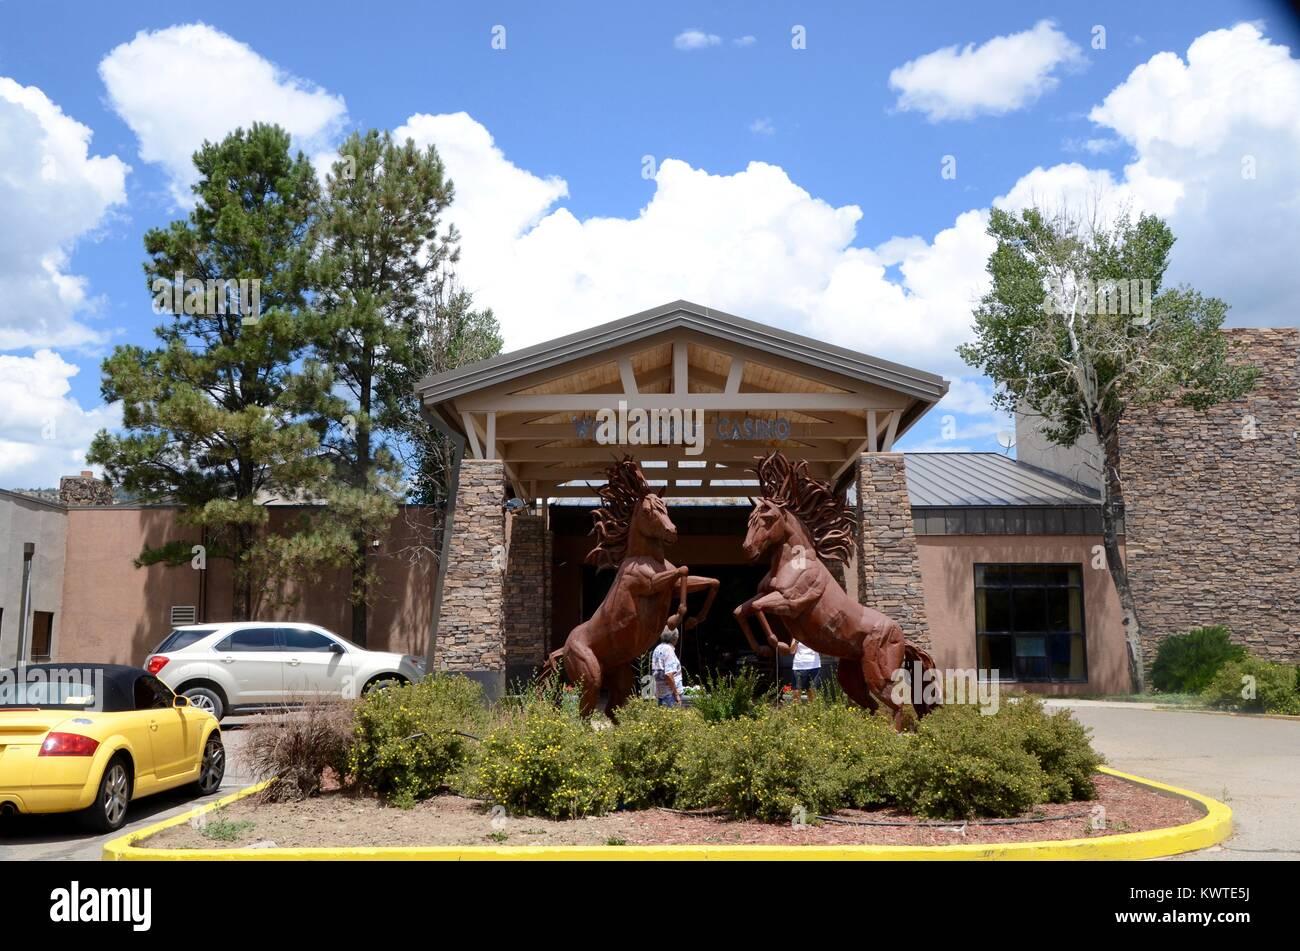 wild horse casino and hotel dulce jicarillo apache reservation new mexico - Stock Image